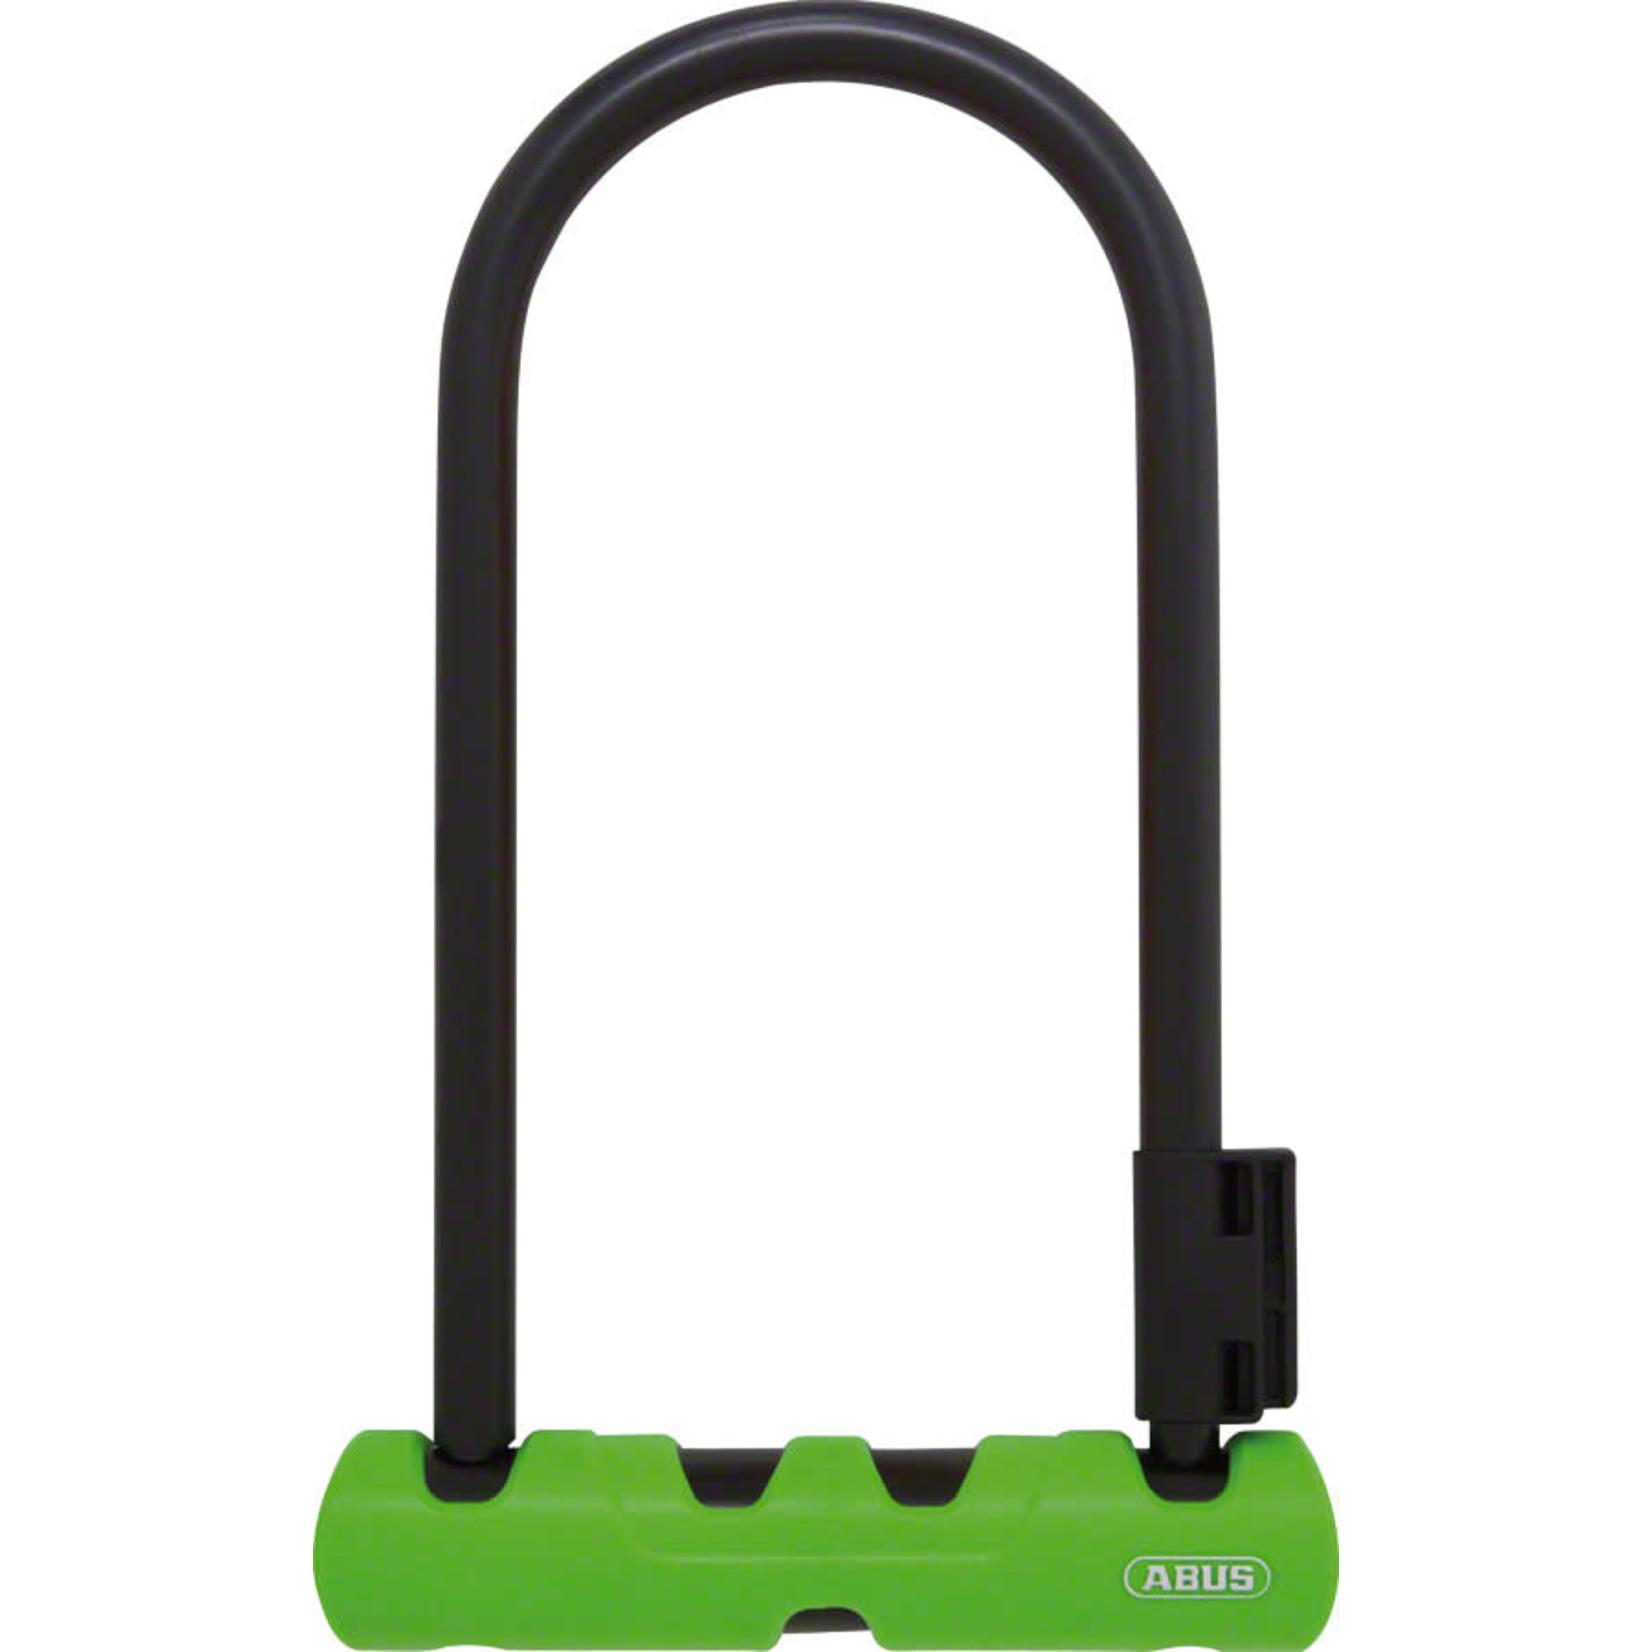 "ABUS Abus Ultra 410 U-Lock - 3.9 x 9"", Keyed, Black, Includes bracket"